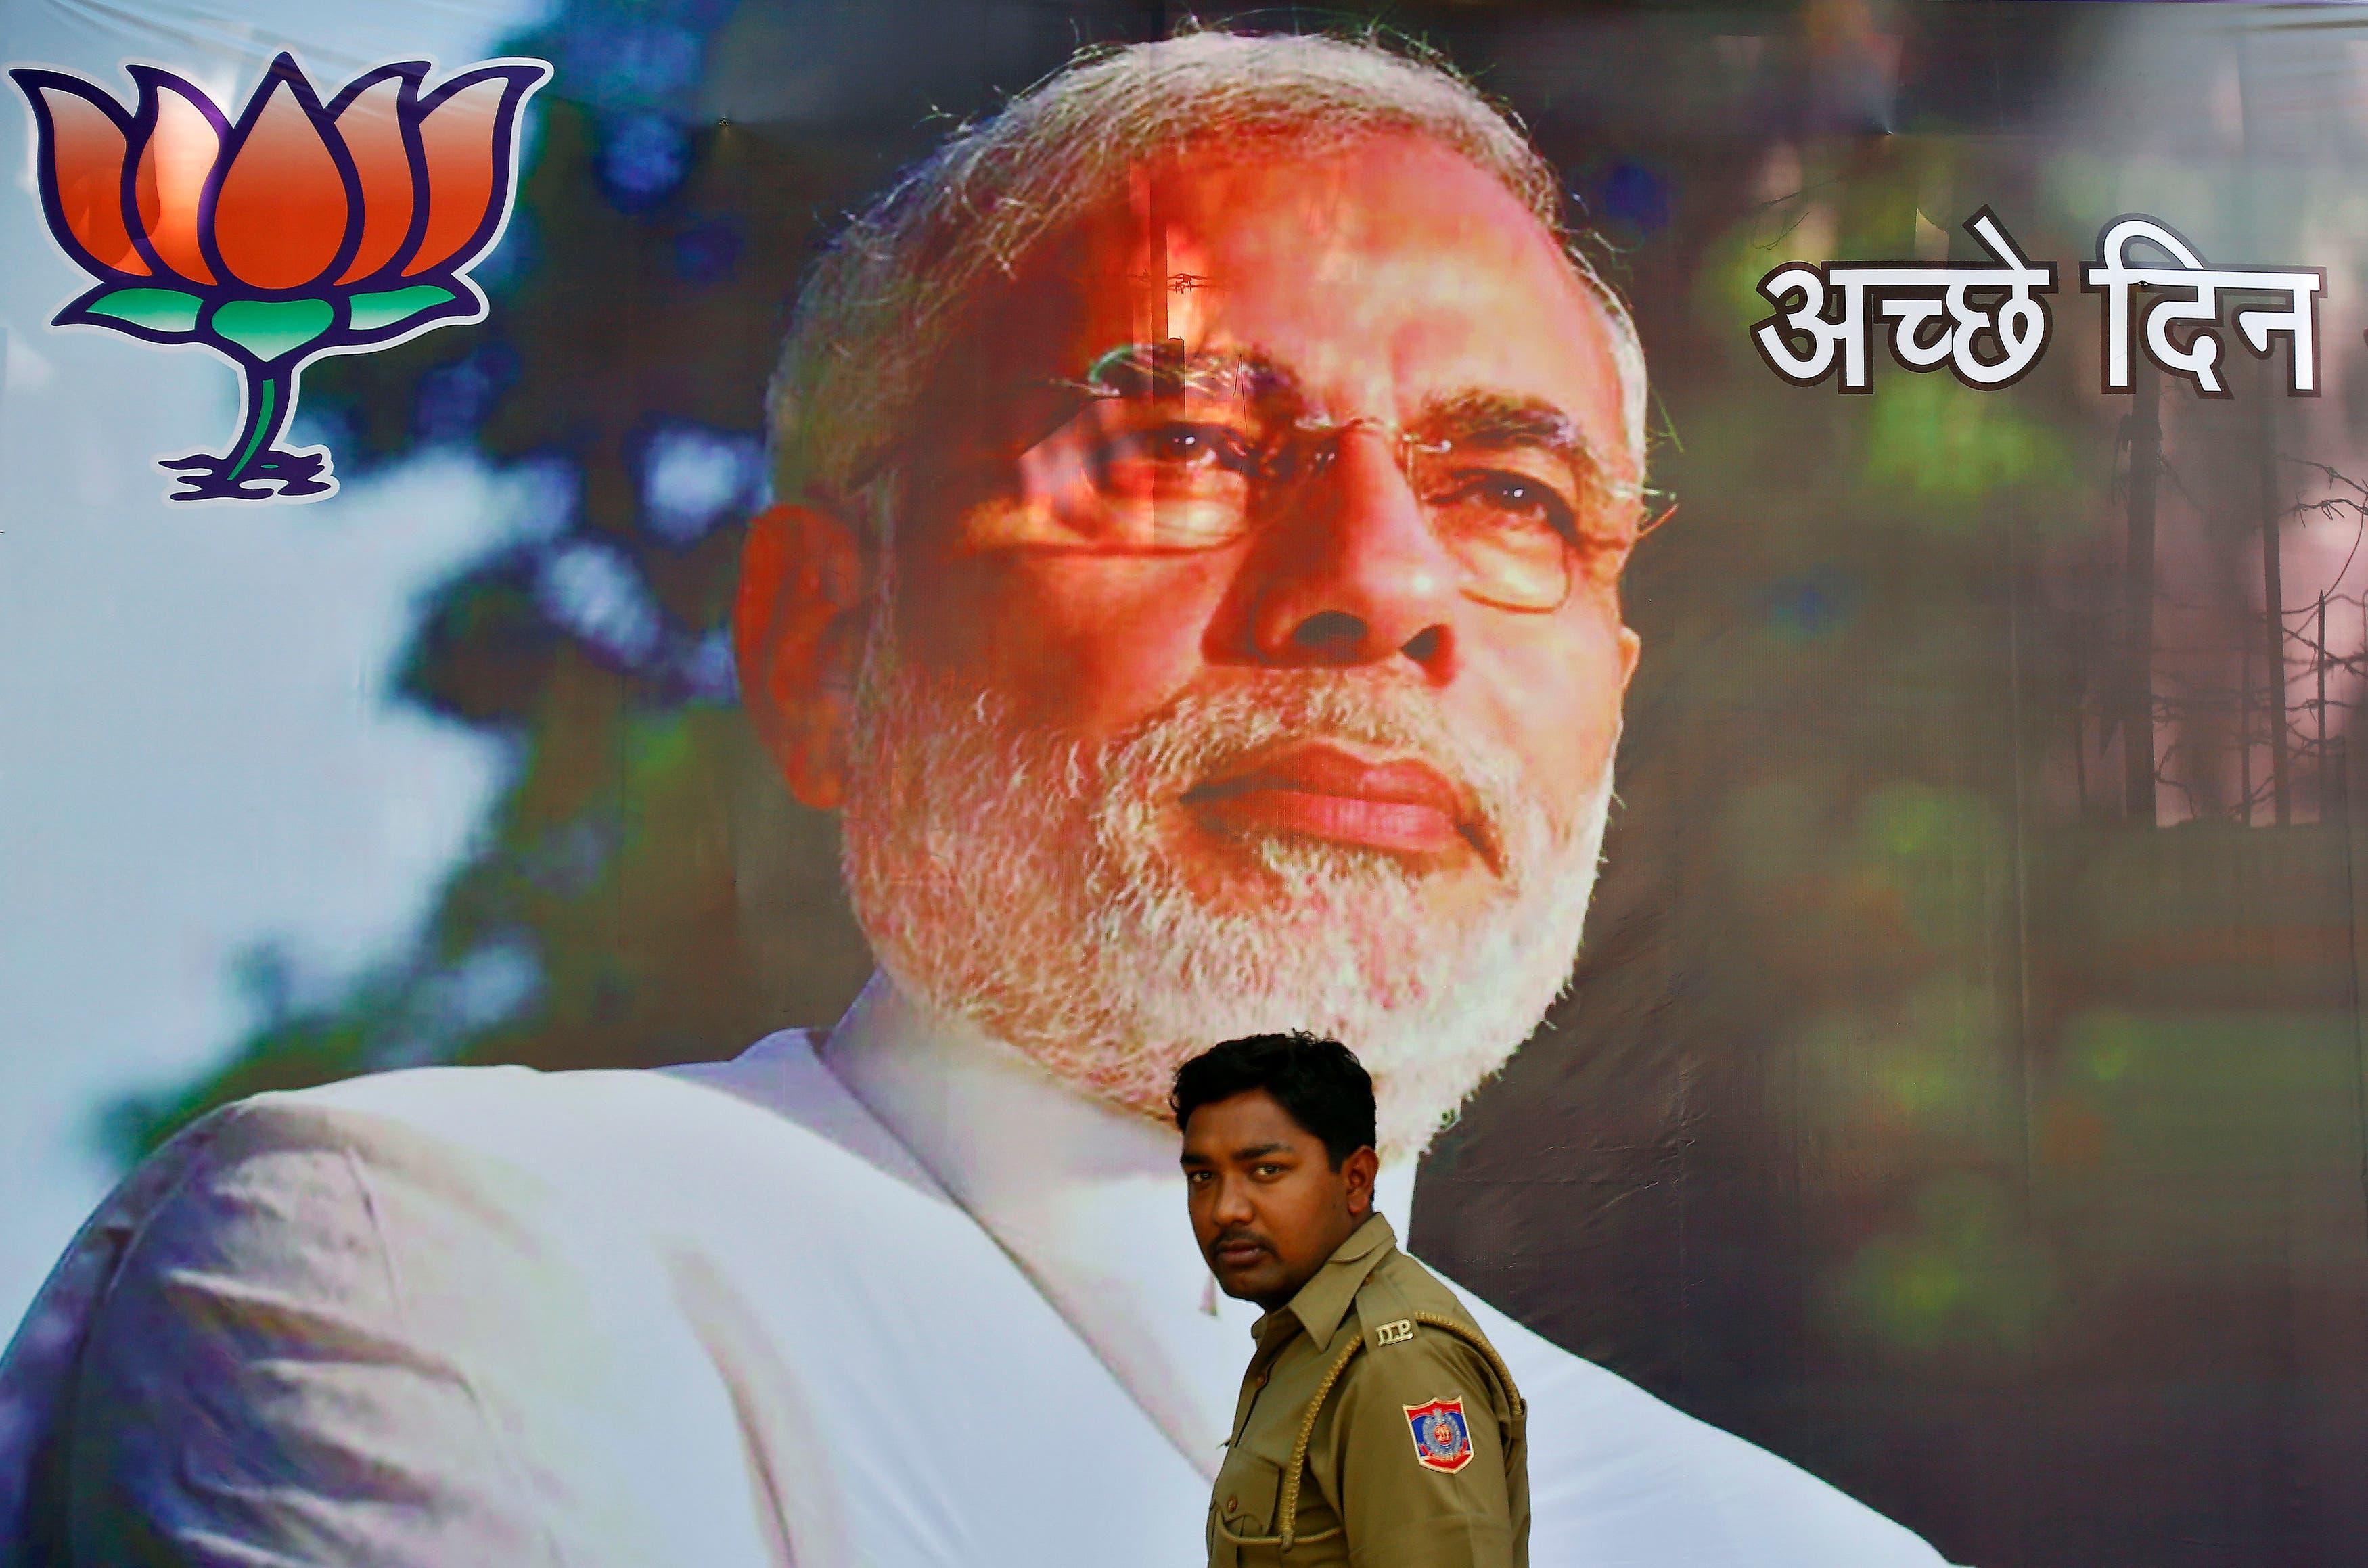 Modi wins Indian elections